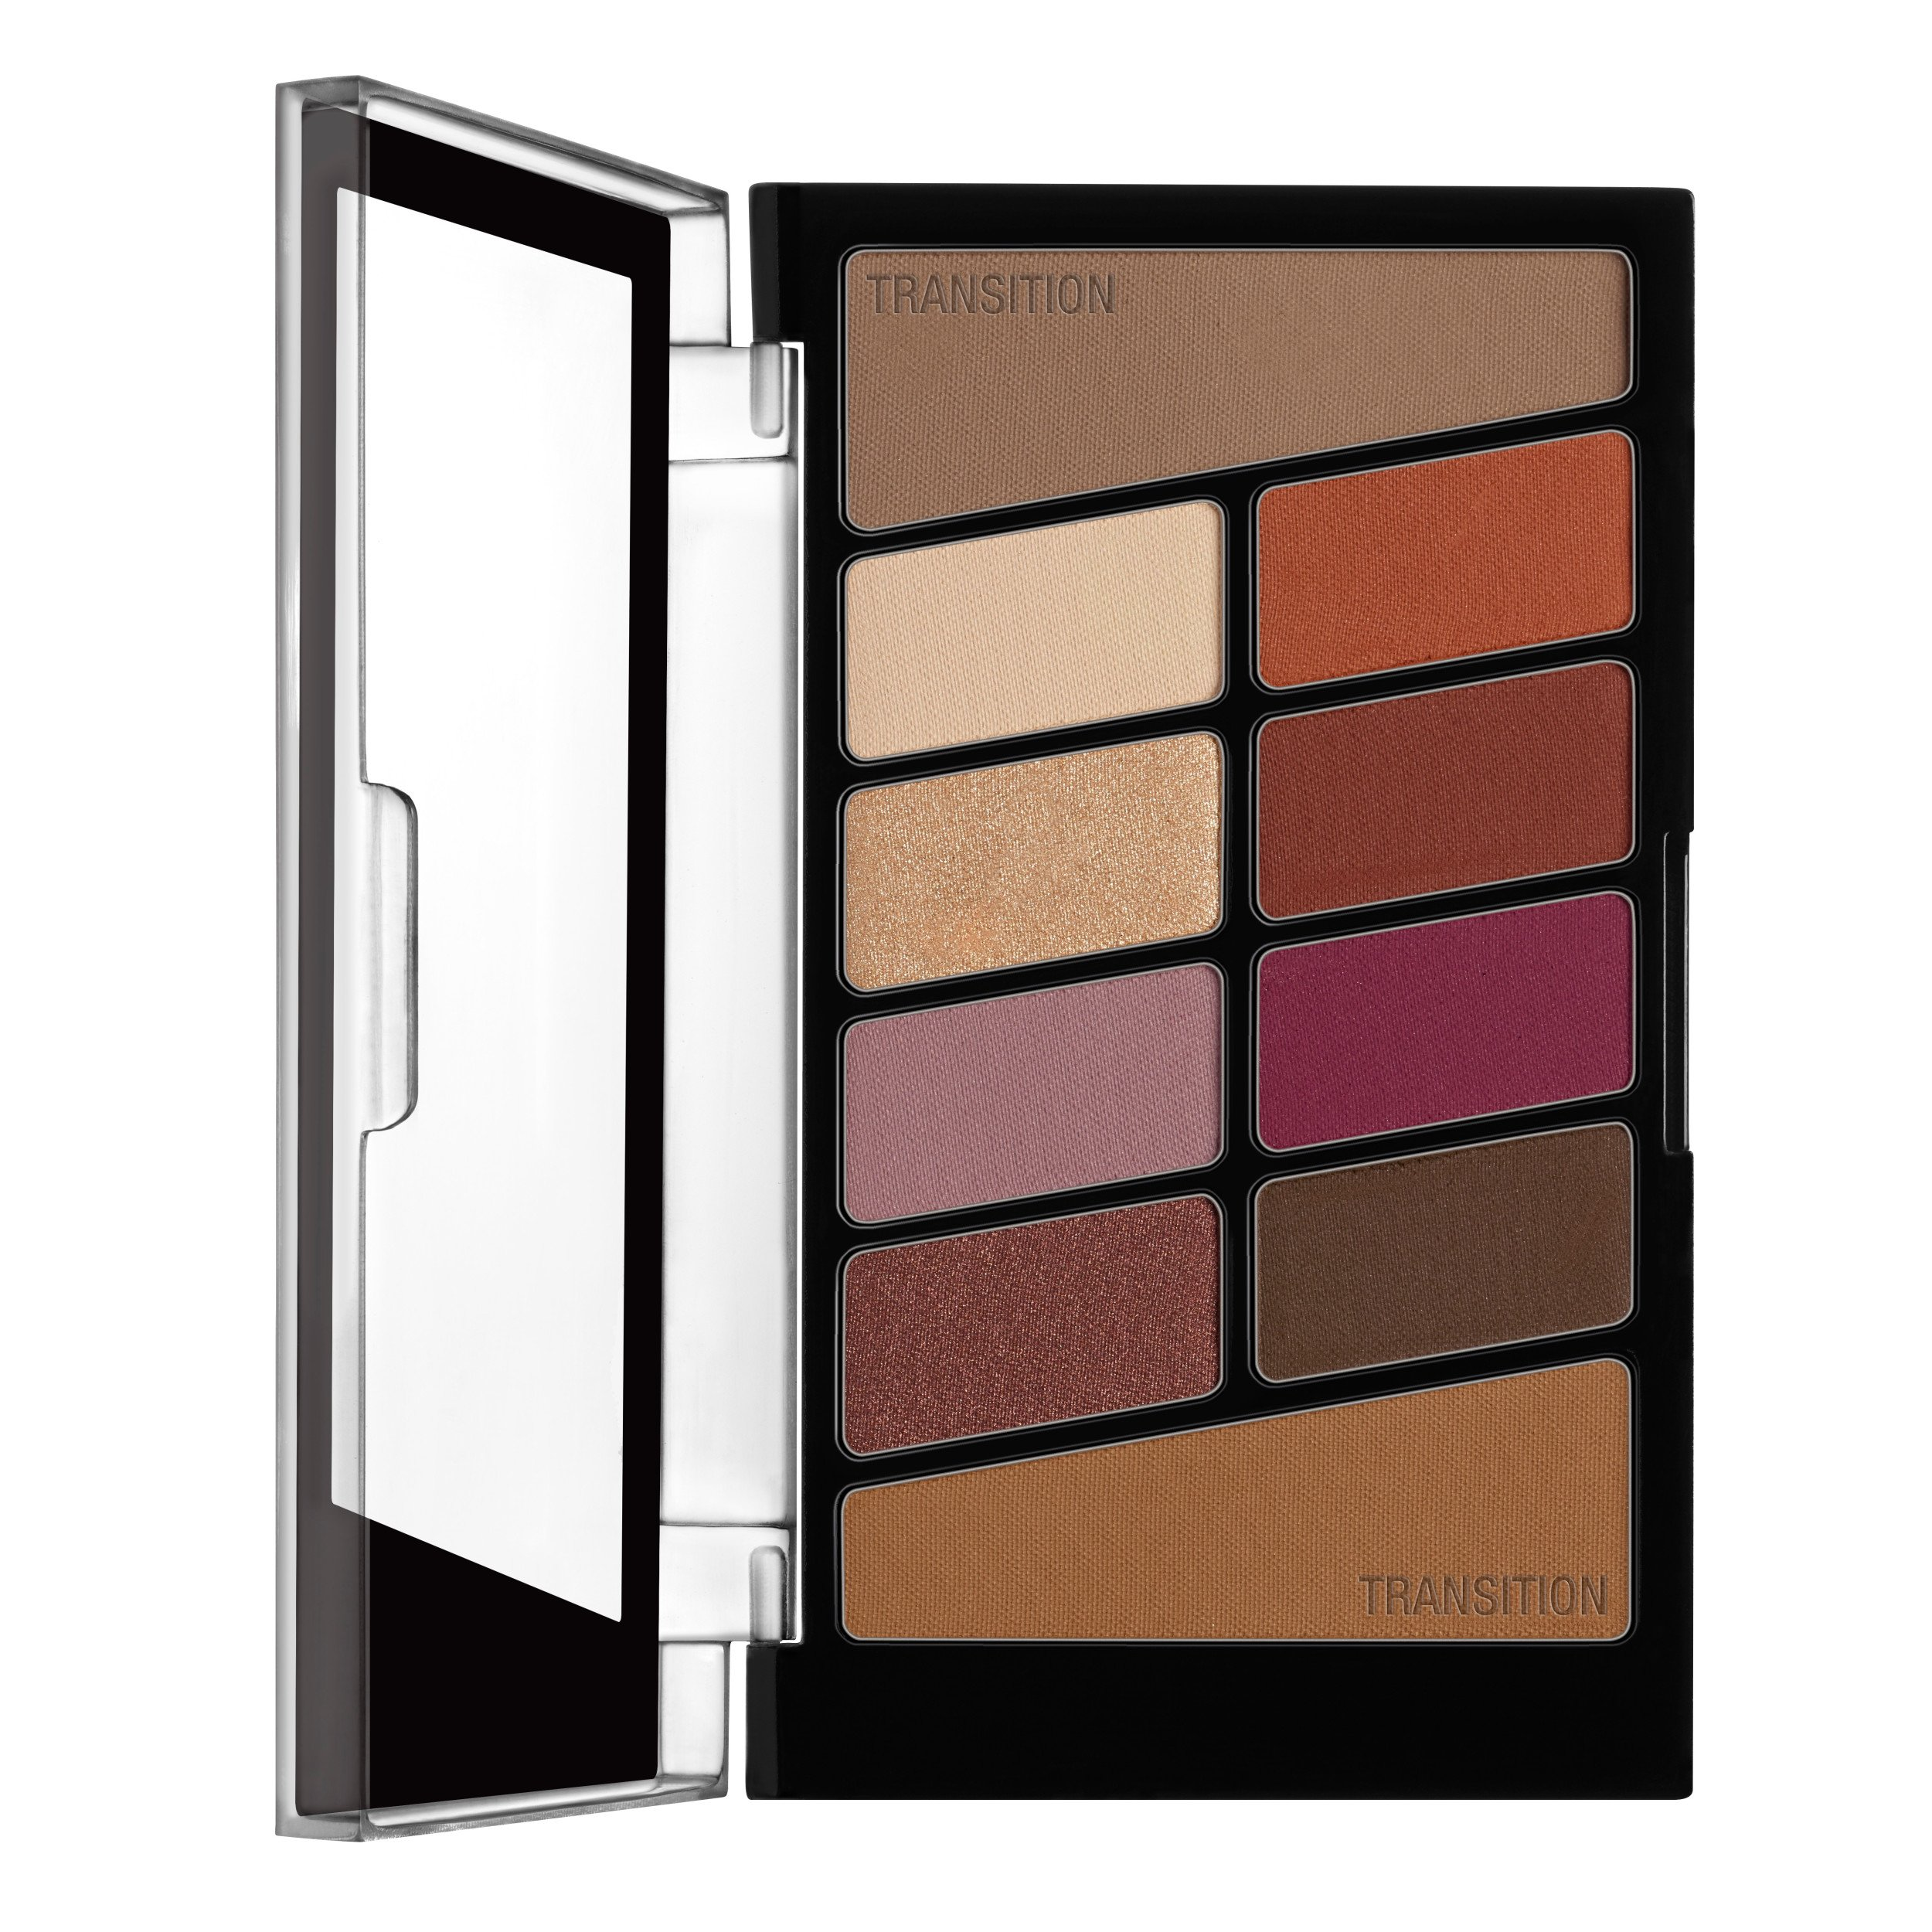 wet n wild Color Icon Eyeshadow 10 Pan Palette, Rose in the Air